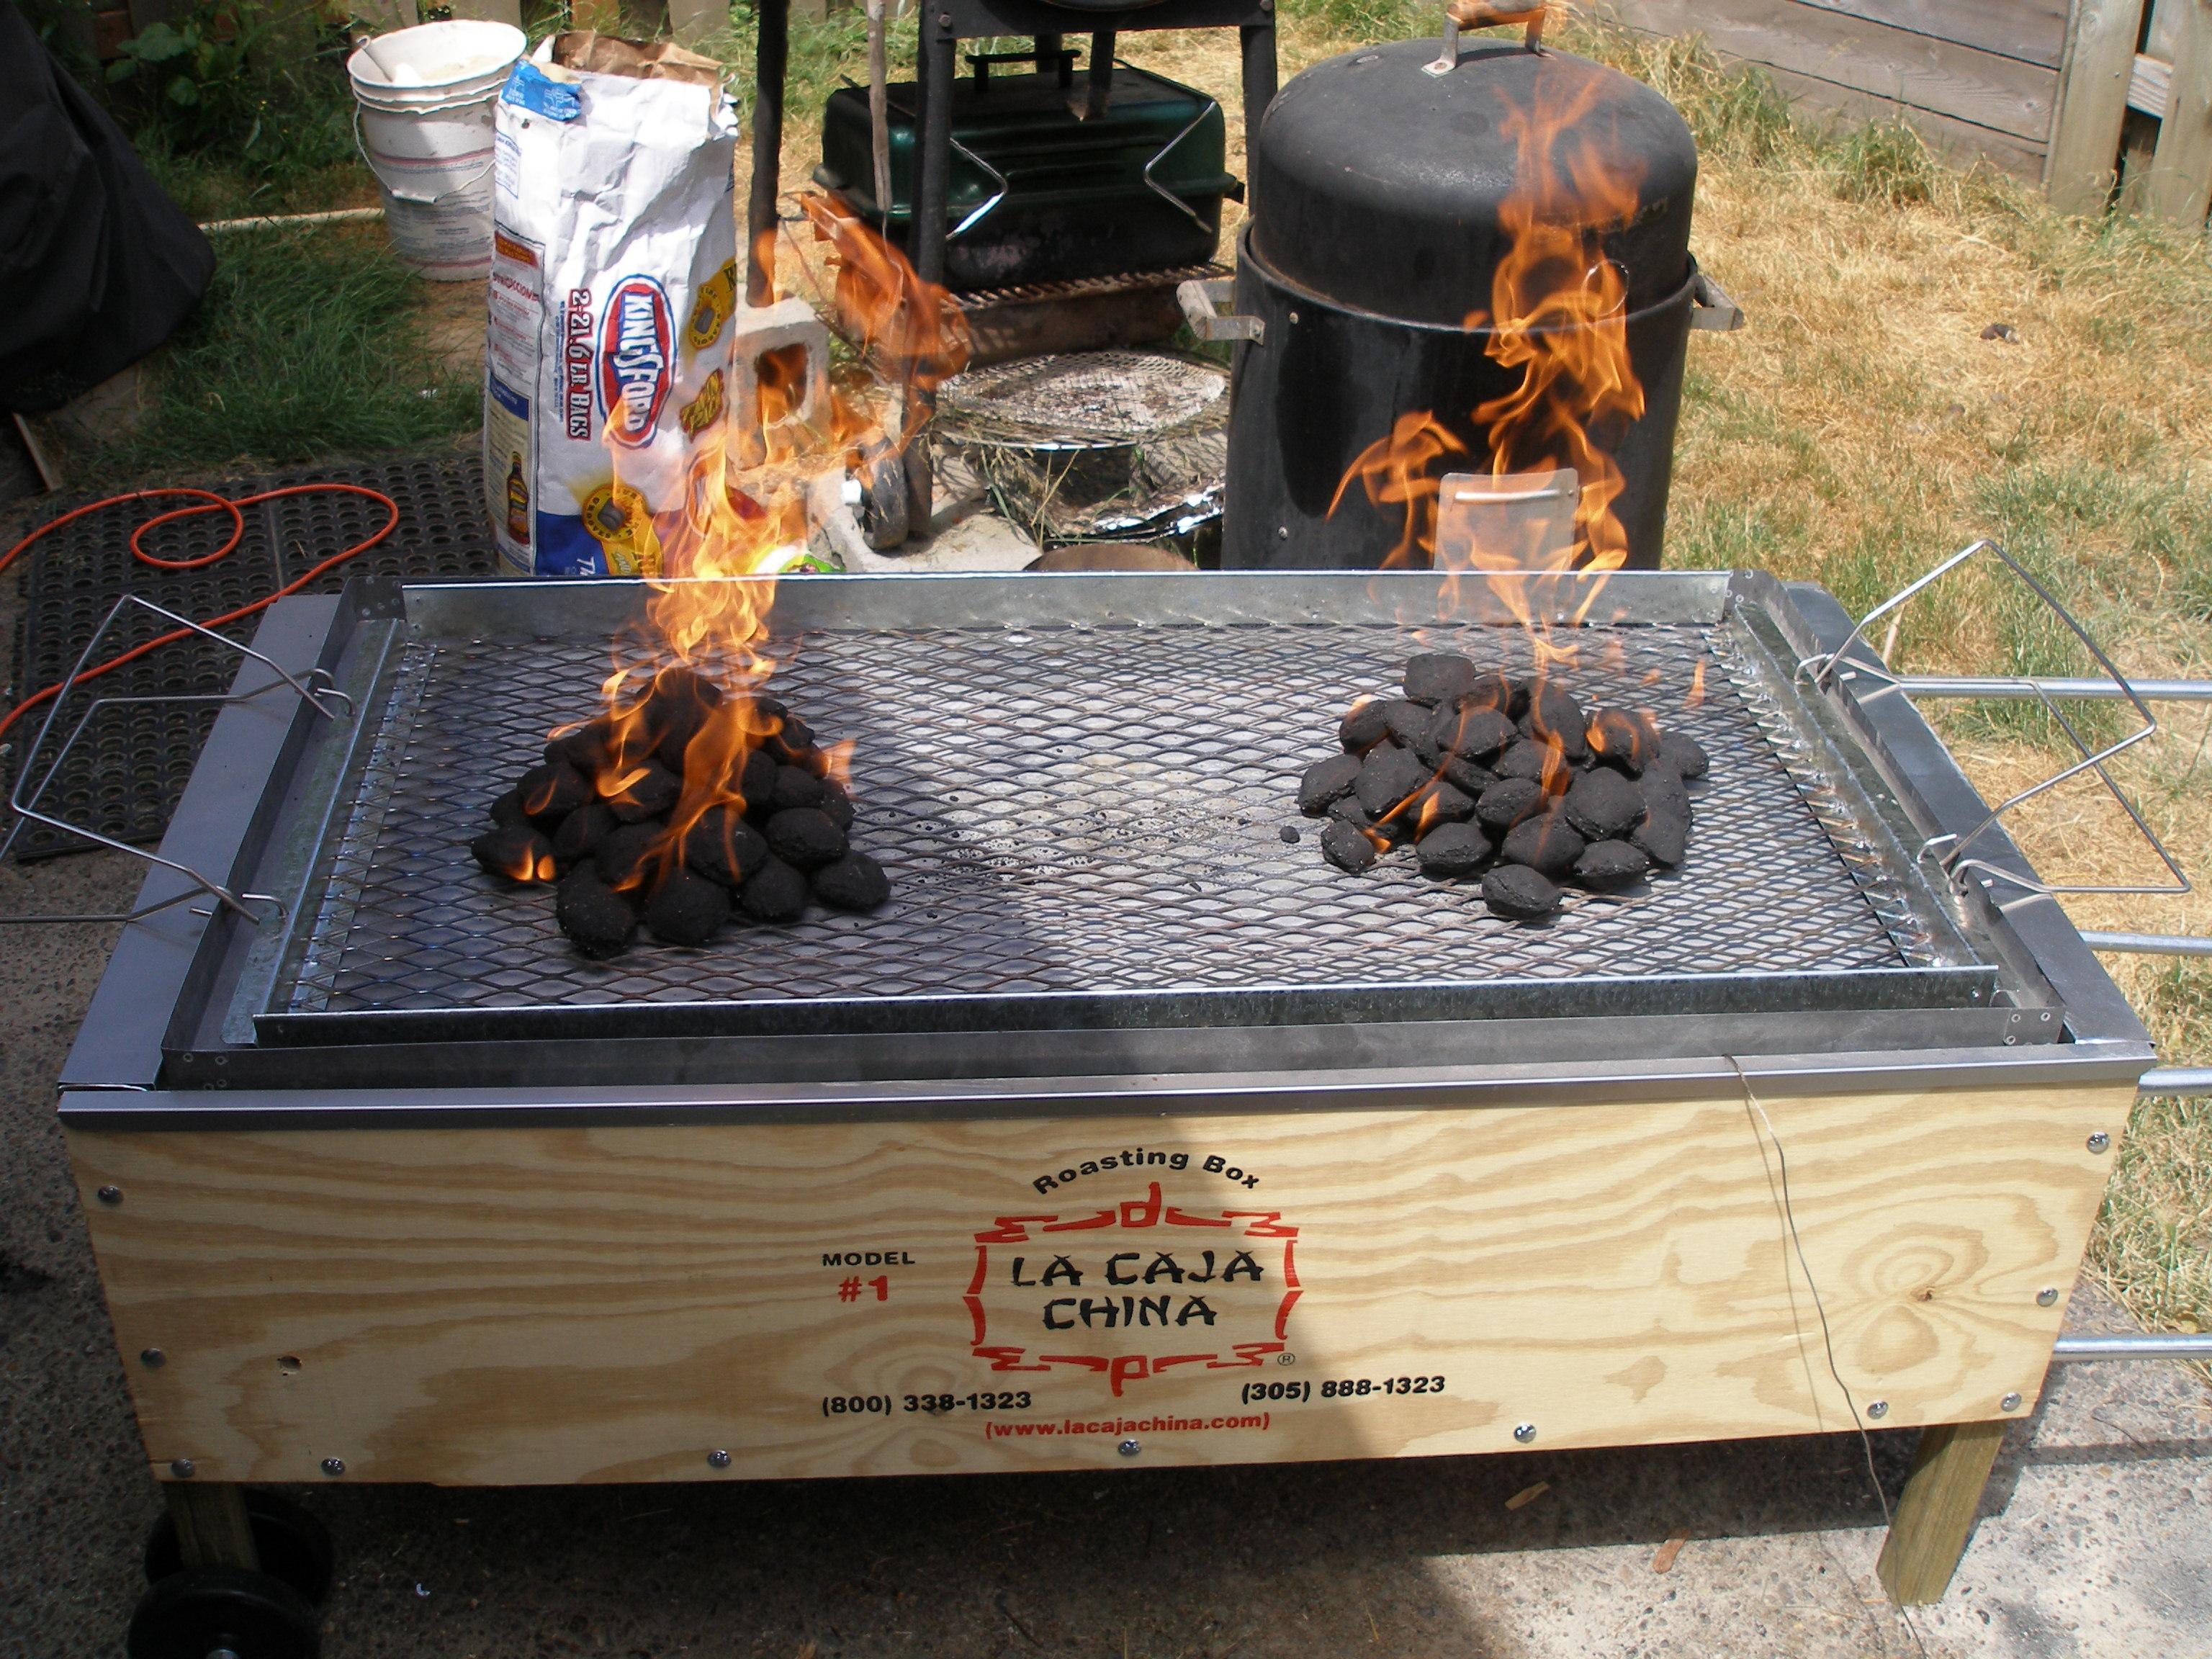 China Box Cooker ~ Beef ribs in la caja china cooking